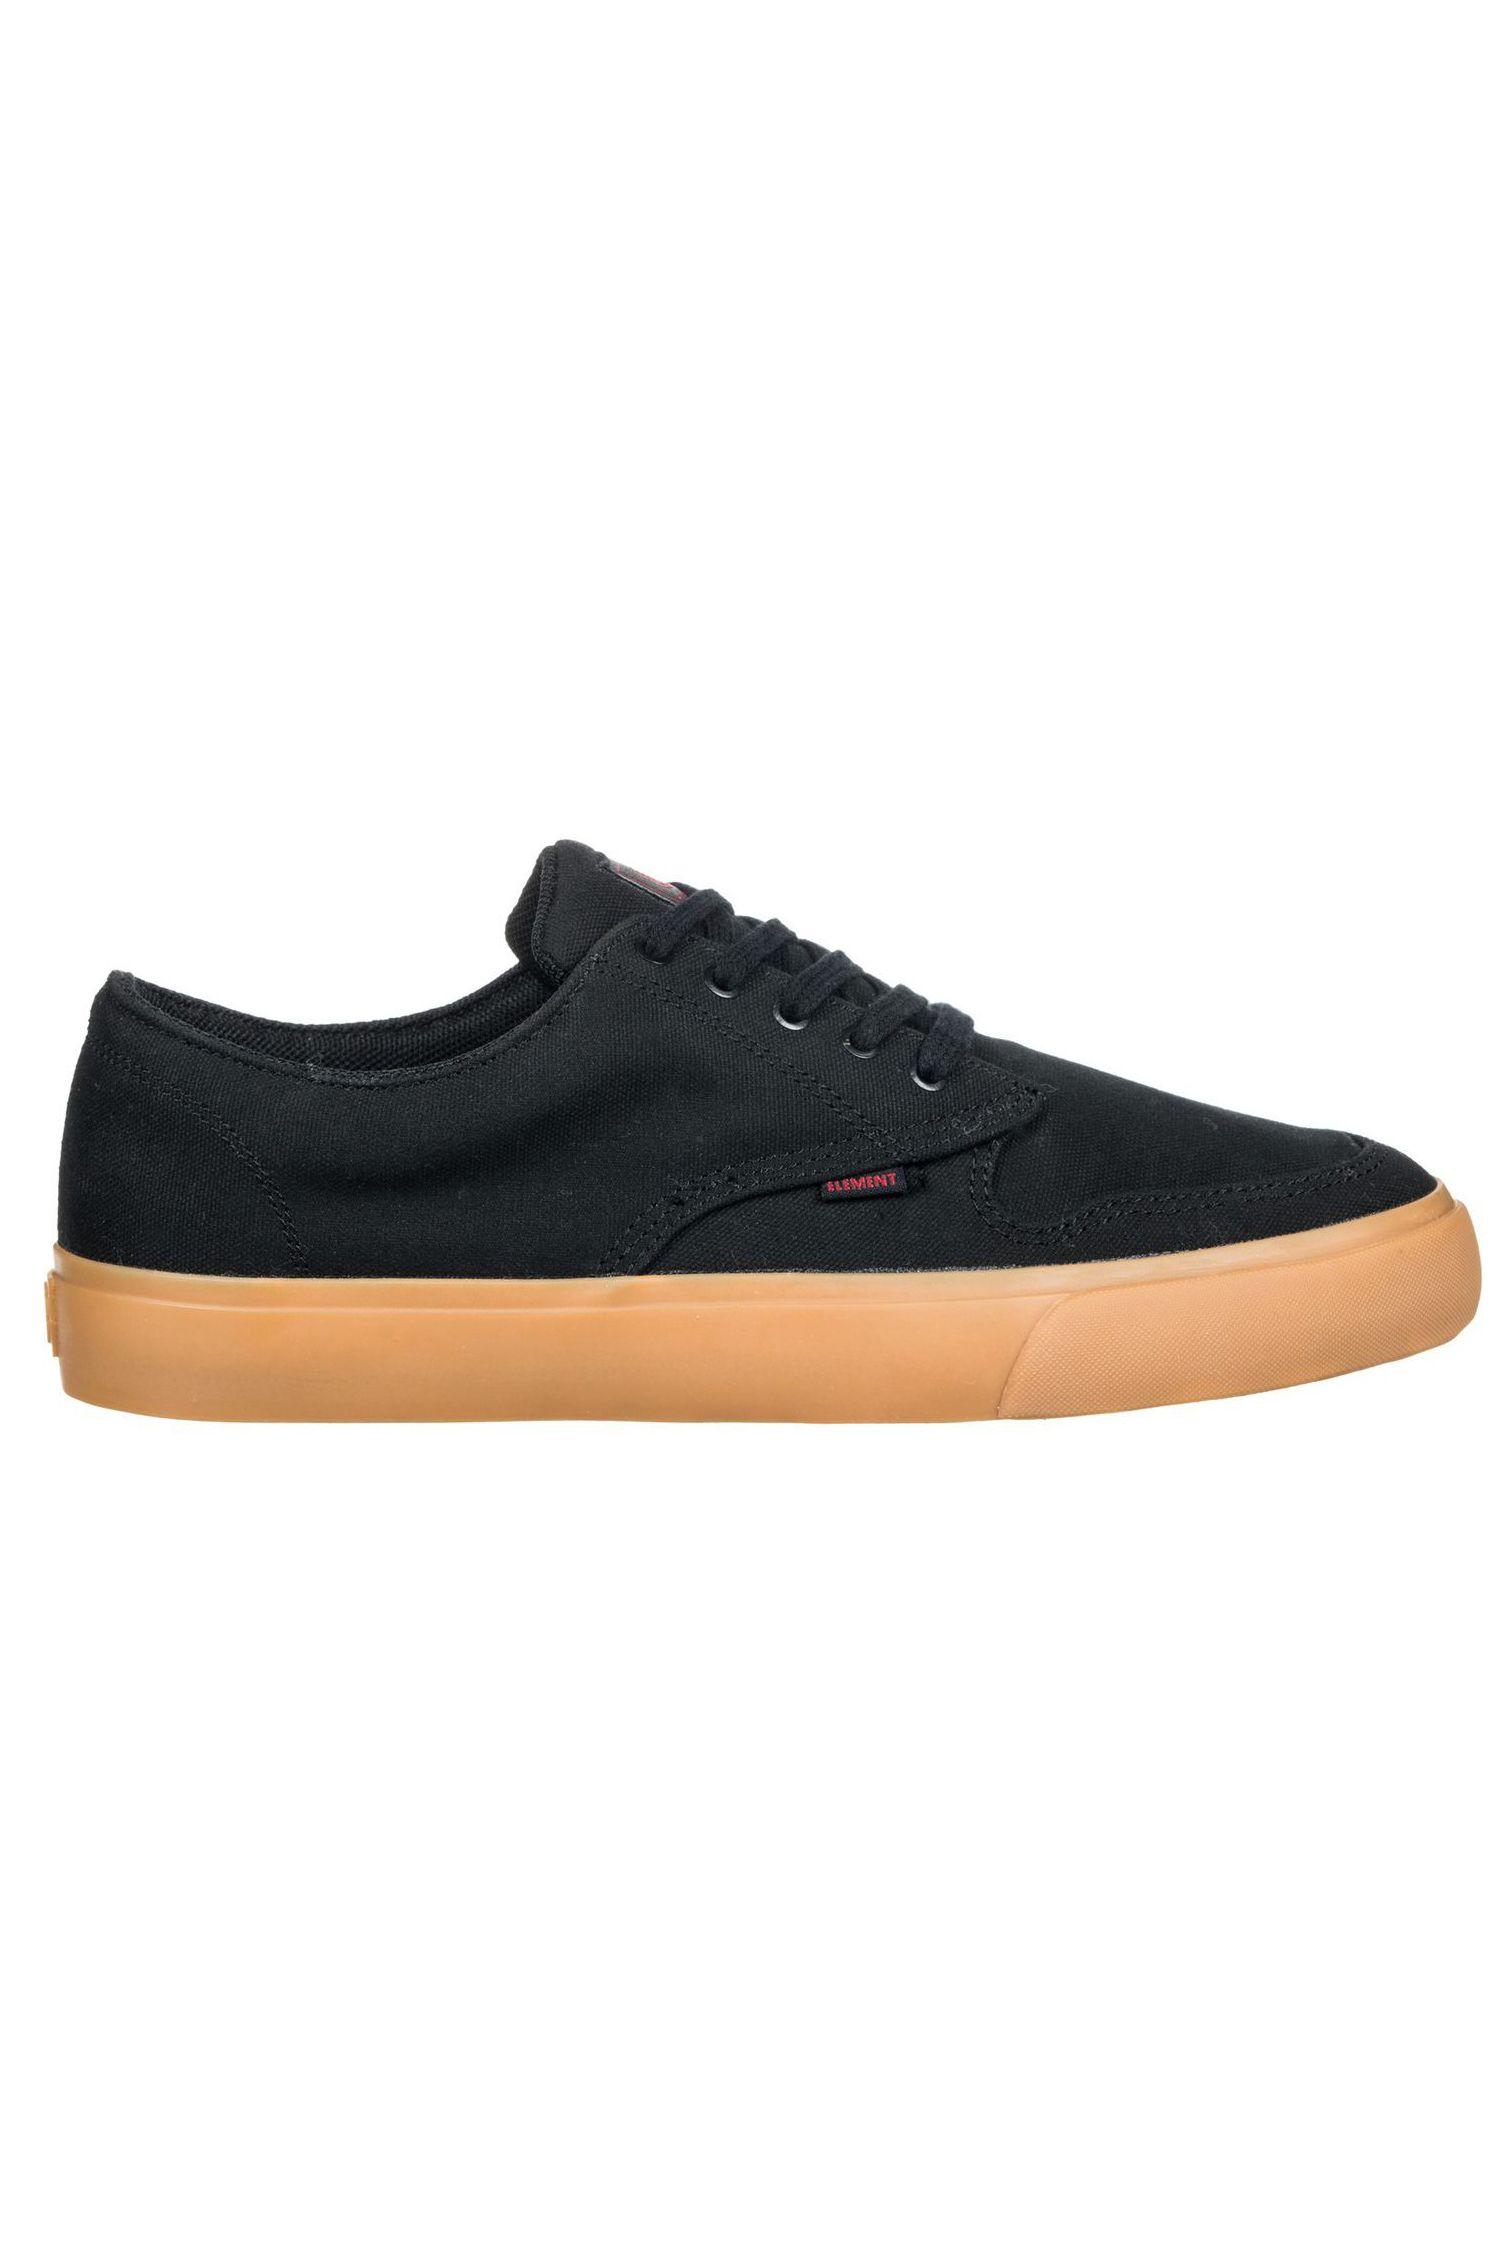 Element Shoes TOPAZ C3 Black Gum Red